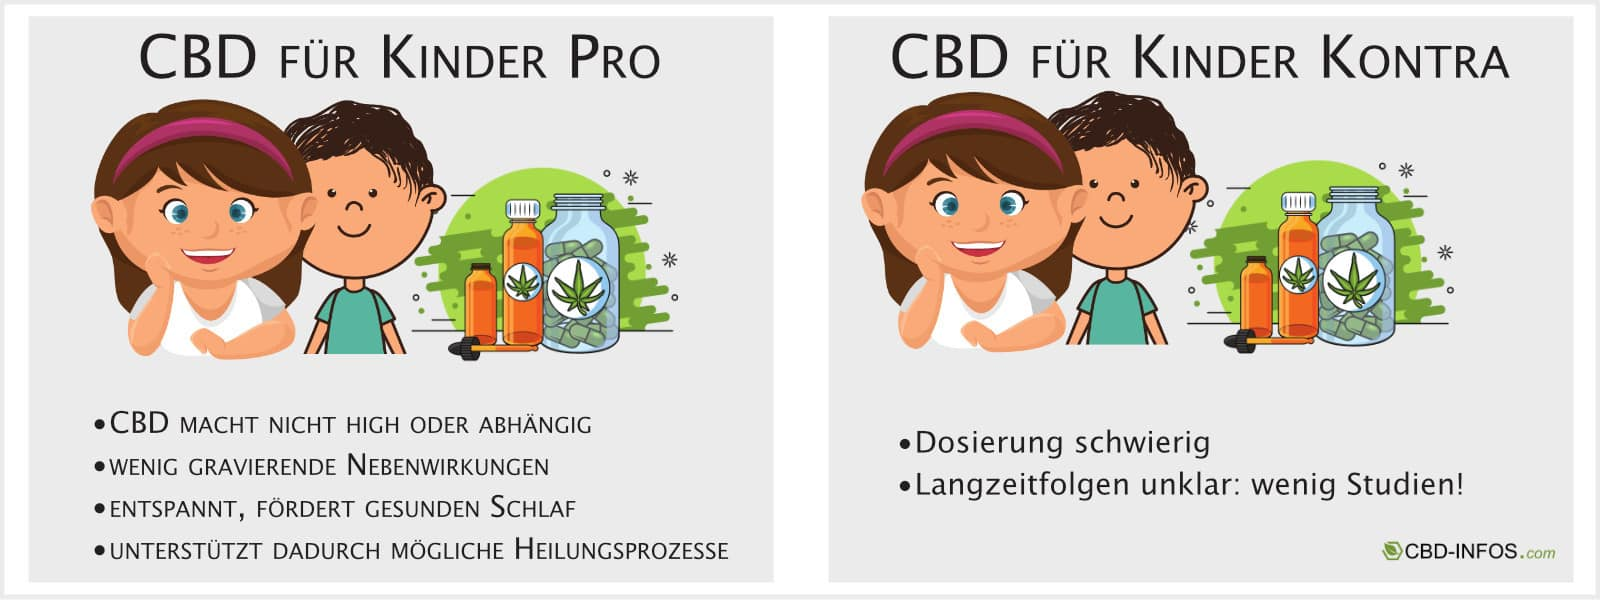 Infografik von CBD-Infos.com CBD für Kinder